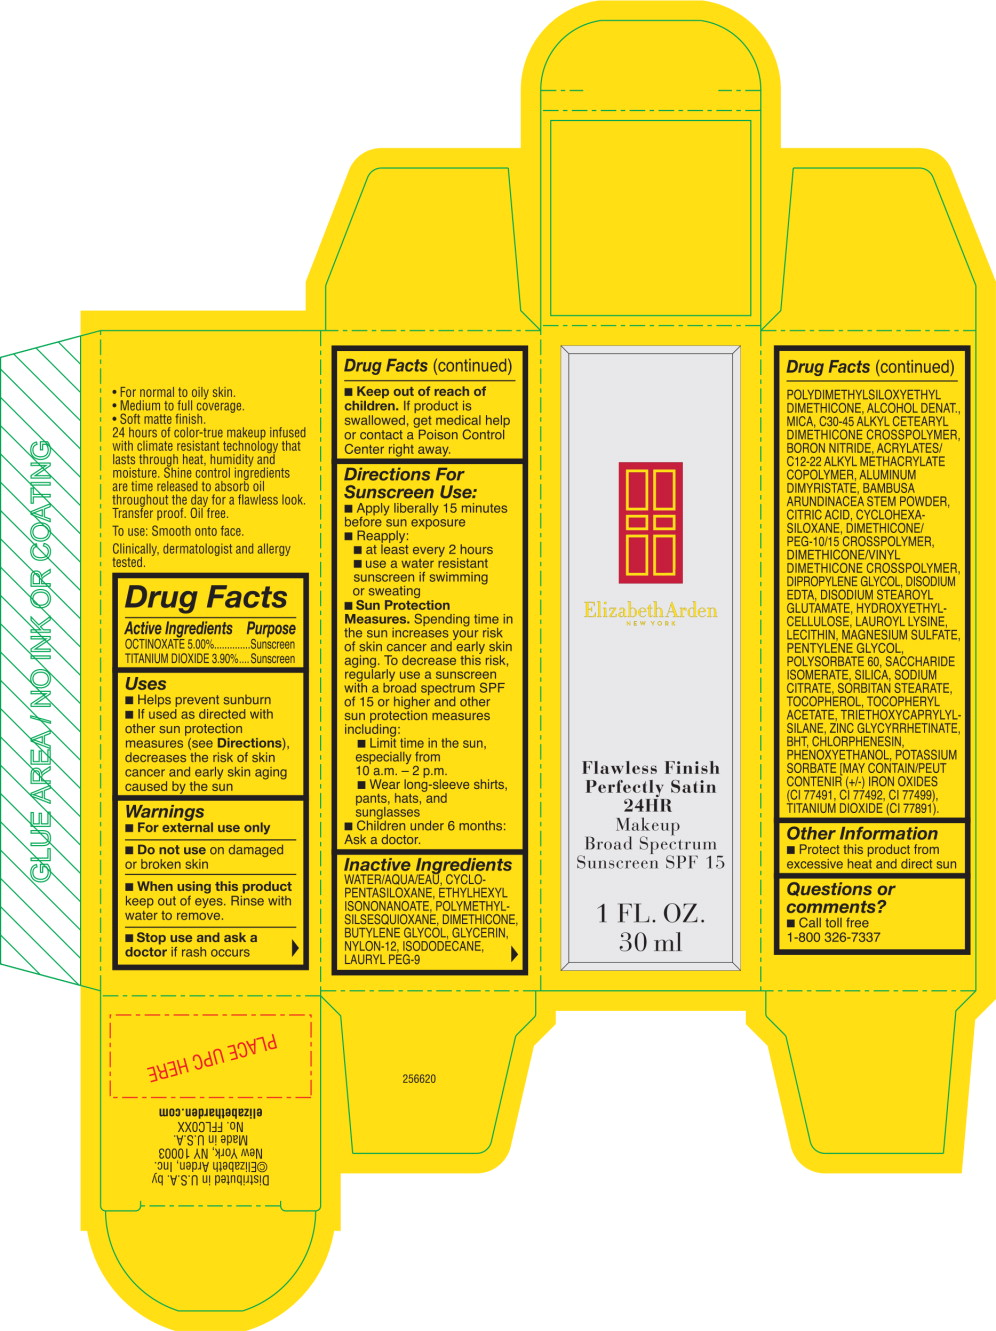 Flawless Finish Perfectly Satinb 24hr Makeup Shade (Octinoxate, Titanium Dioxide) Cream [Elizabeth Arden, Inc]